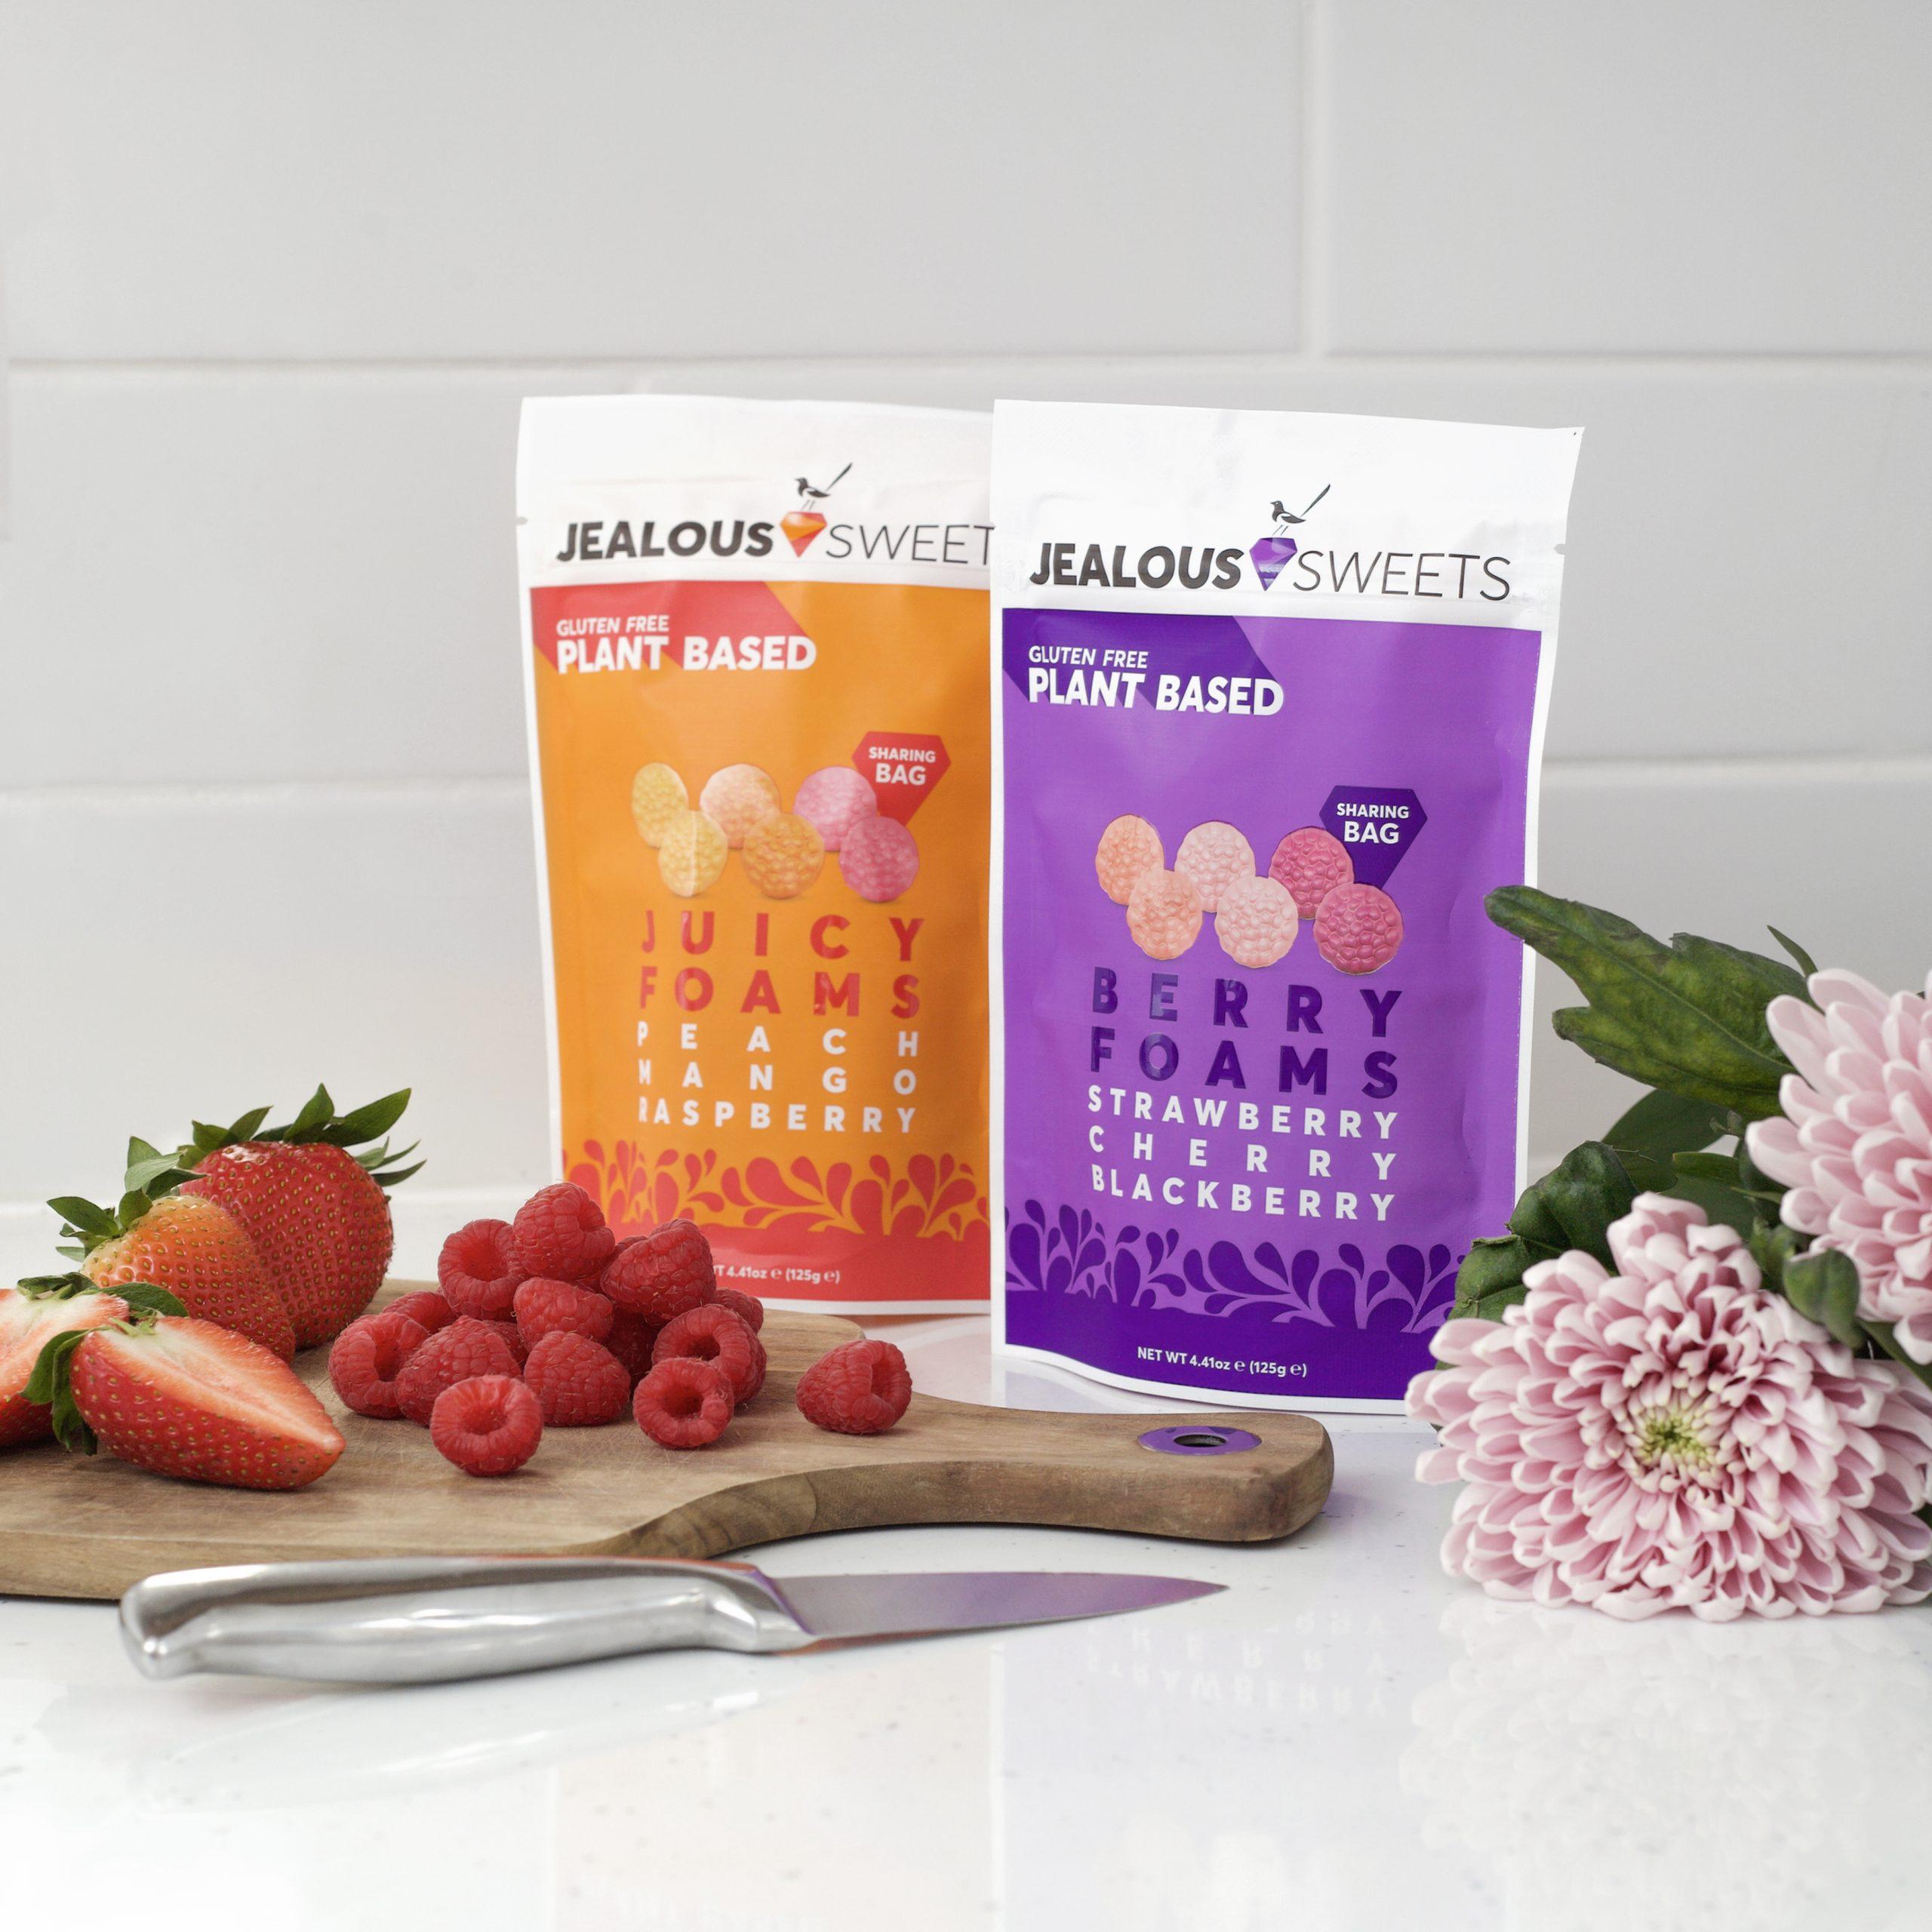 Jealous Sweets launches new Foams range